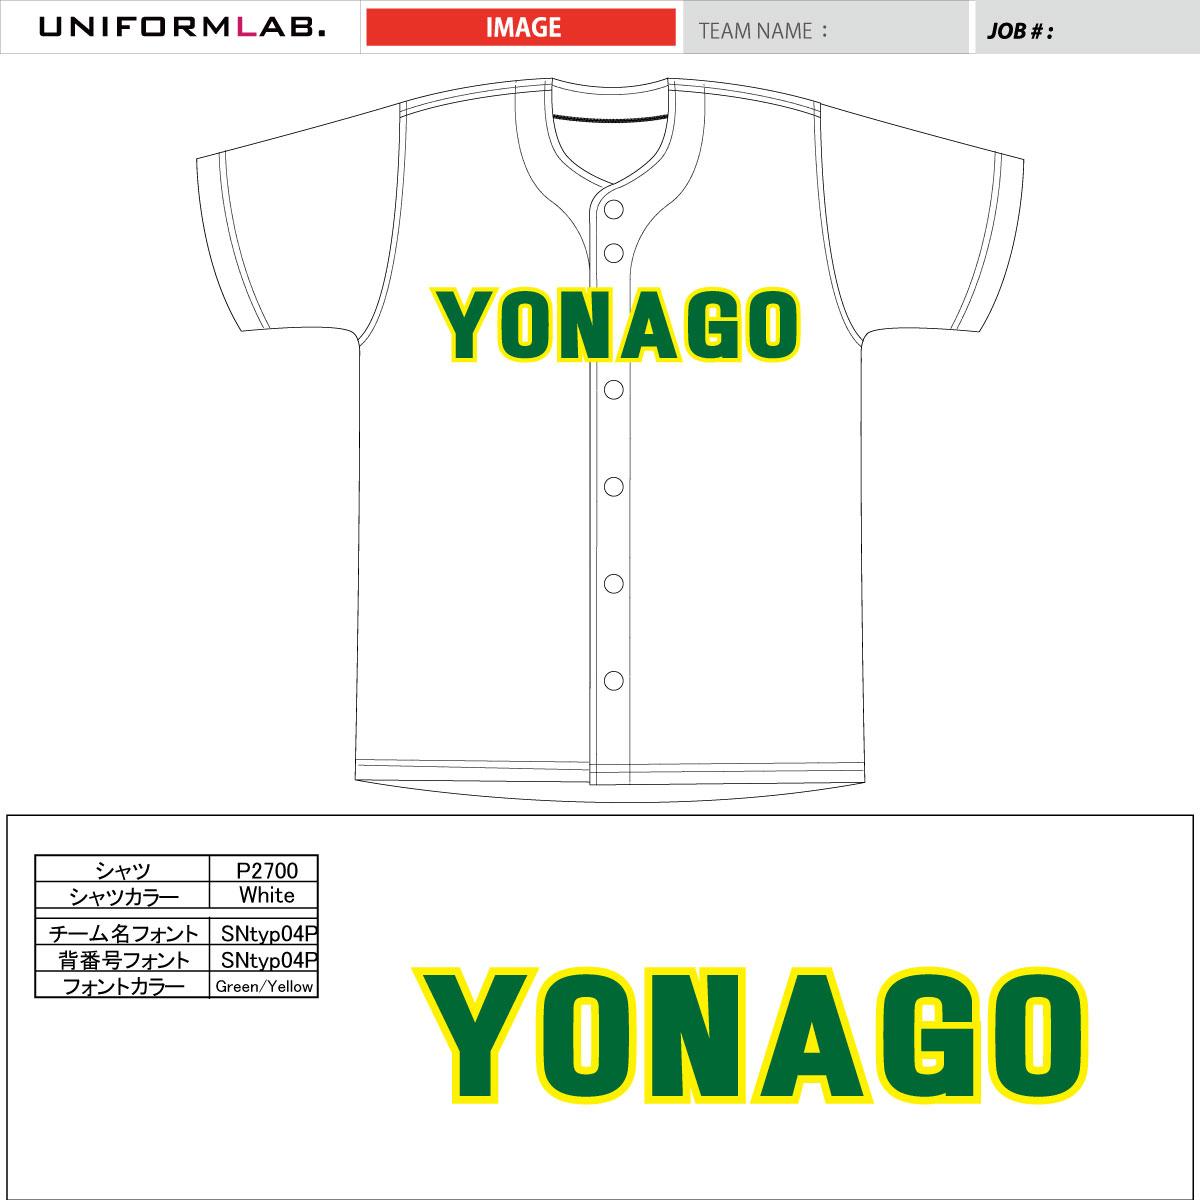 yonago